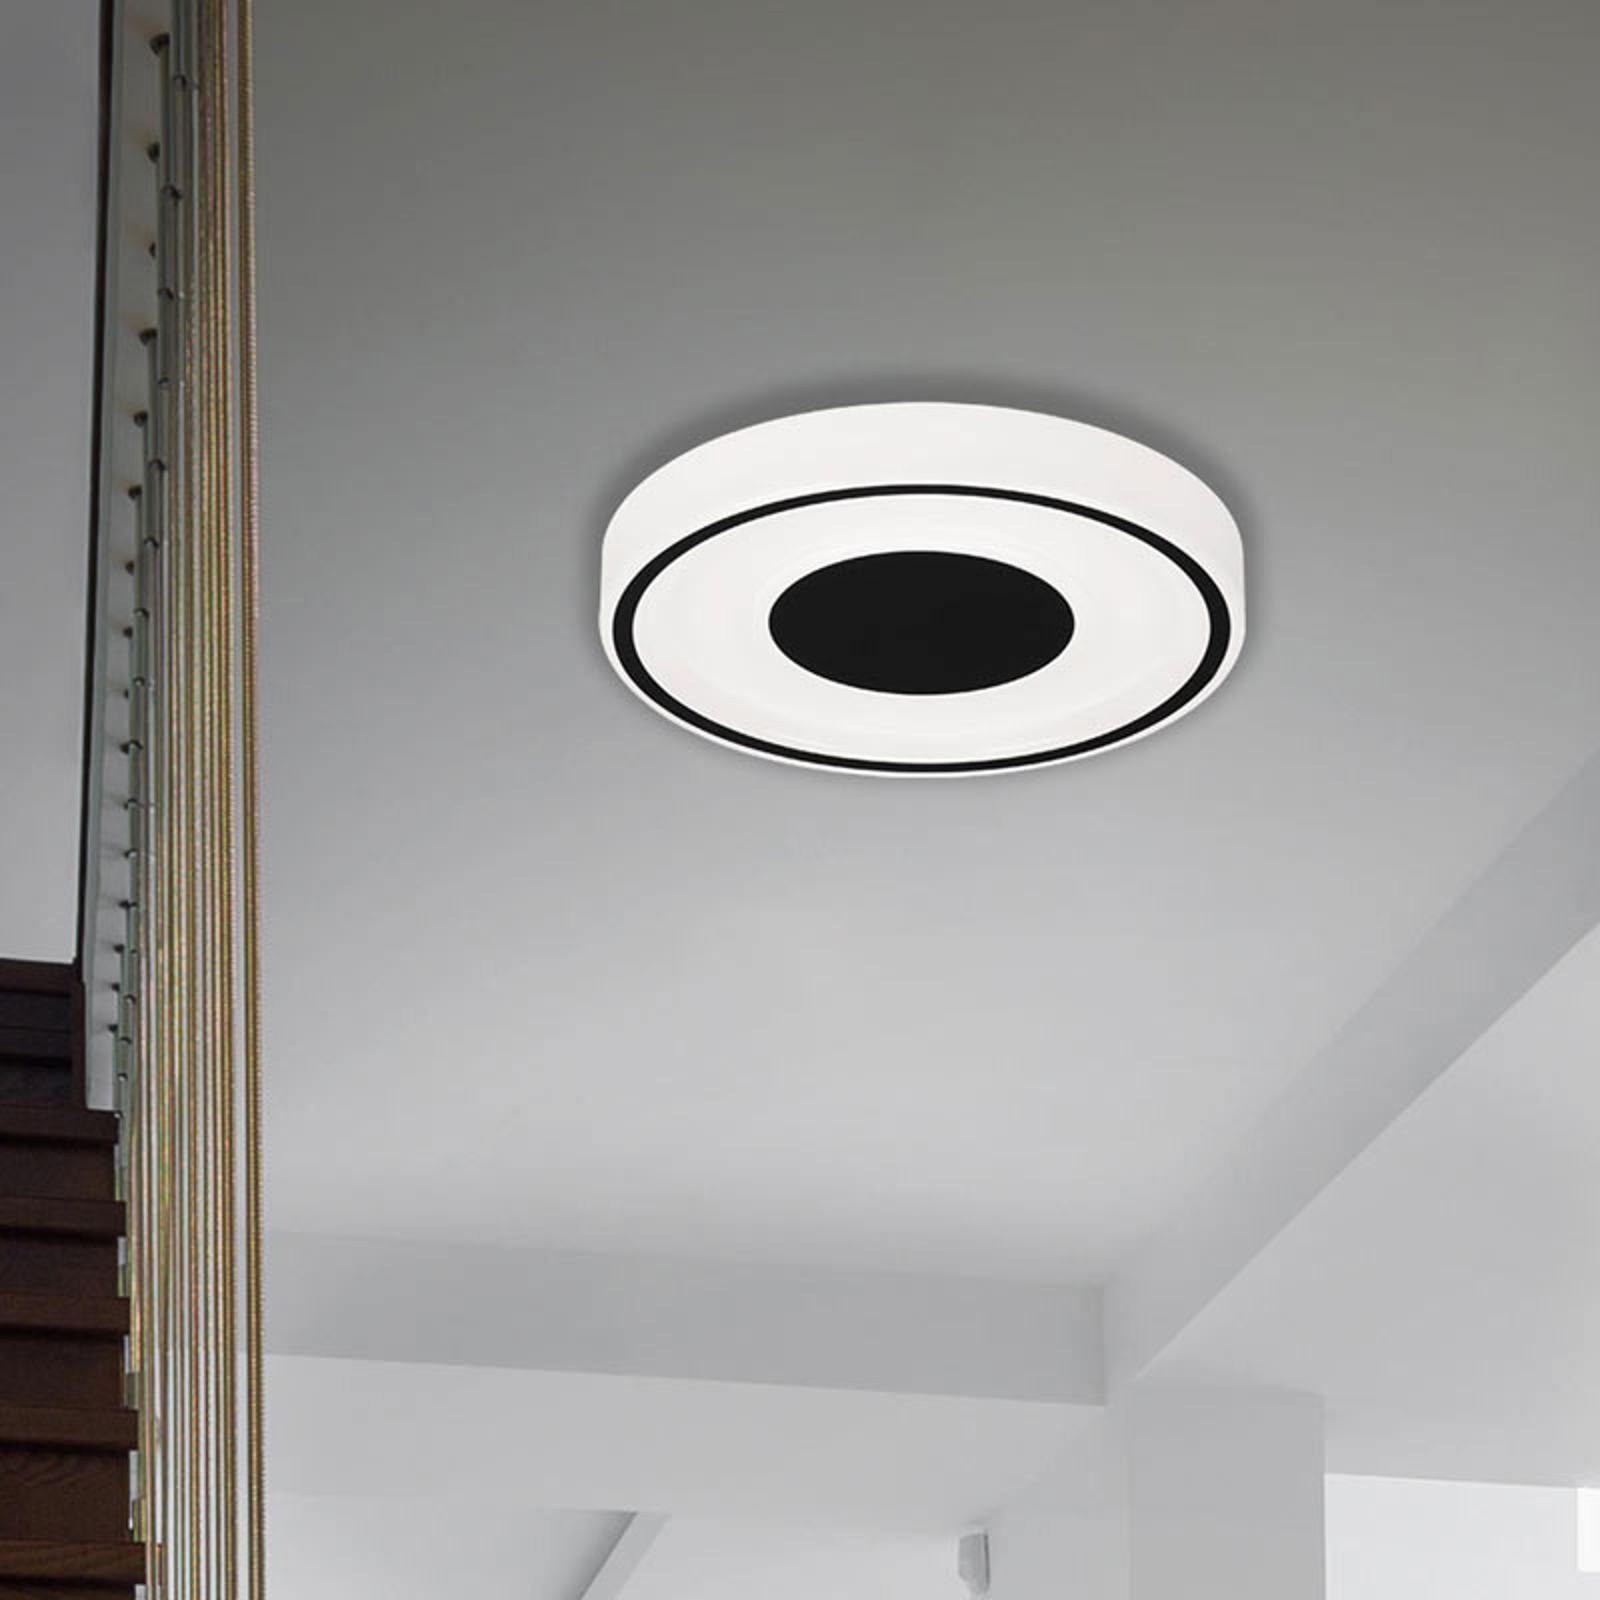 Lampa sufitowa LED Bricks, okrągła, czarna